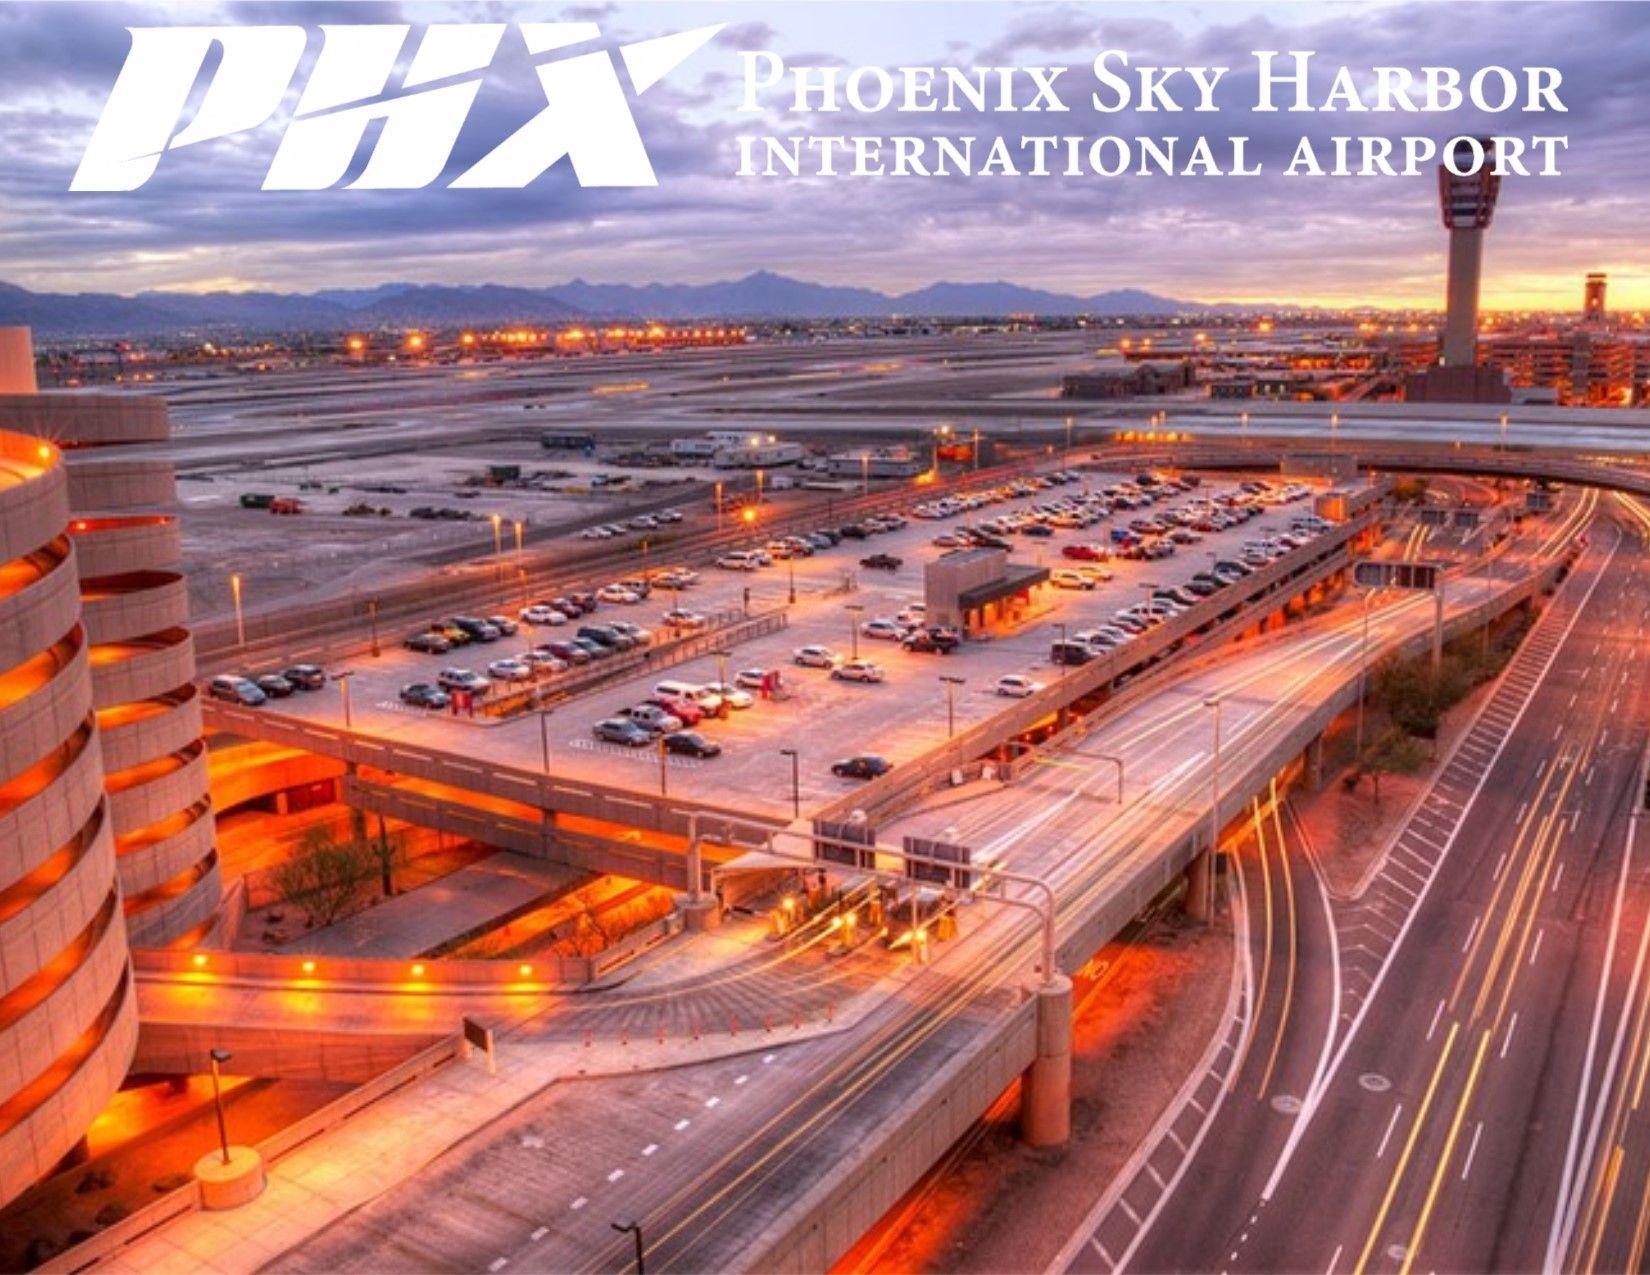 limo service phoenix sky harbor